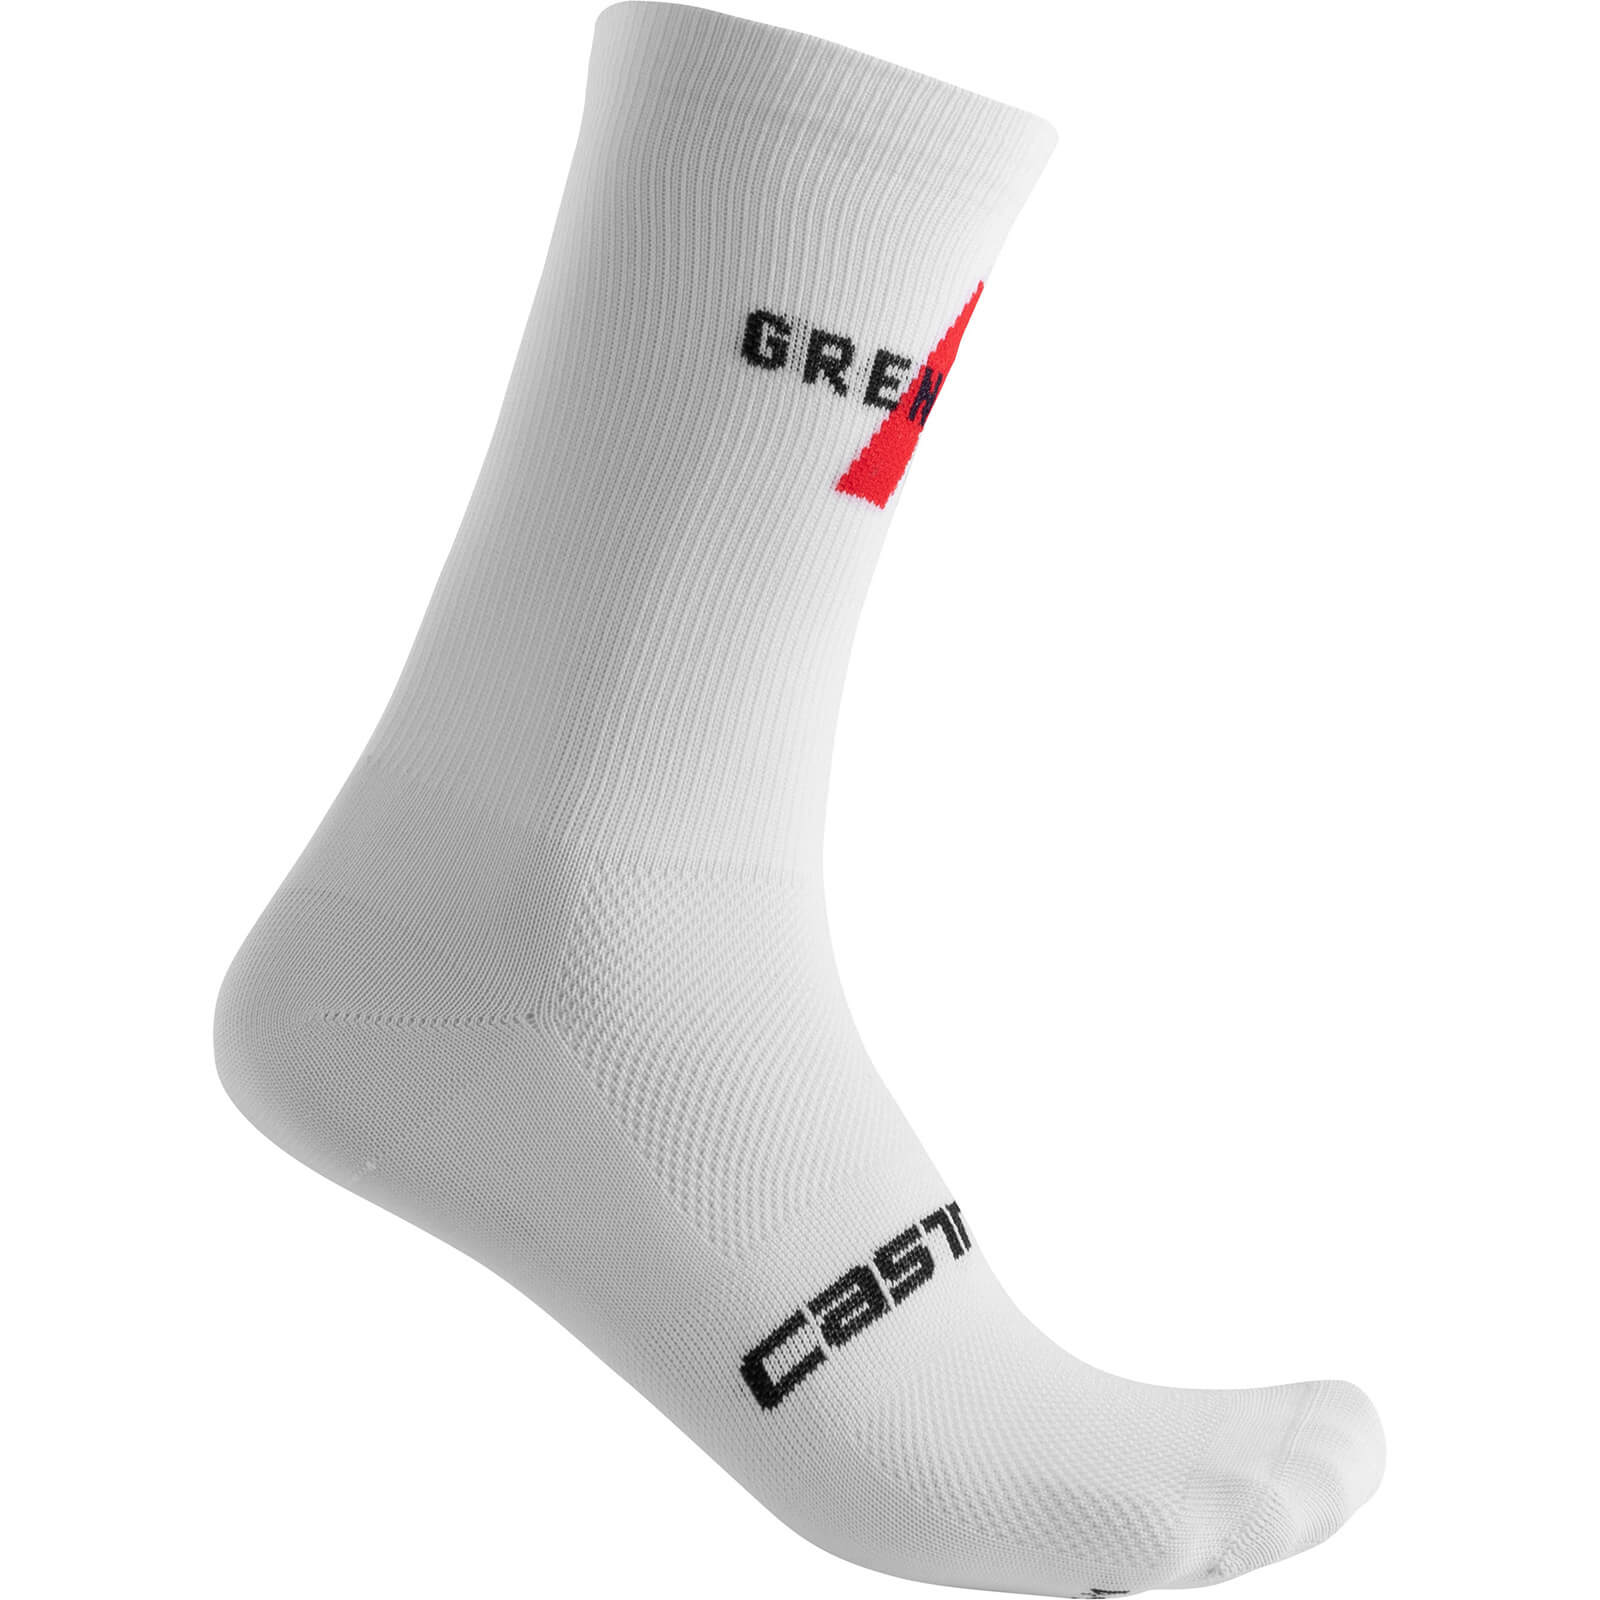 Castelli Team Ineos Grenadier Free 12 Socks - Xxl - White